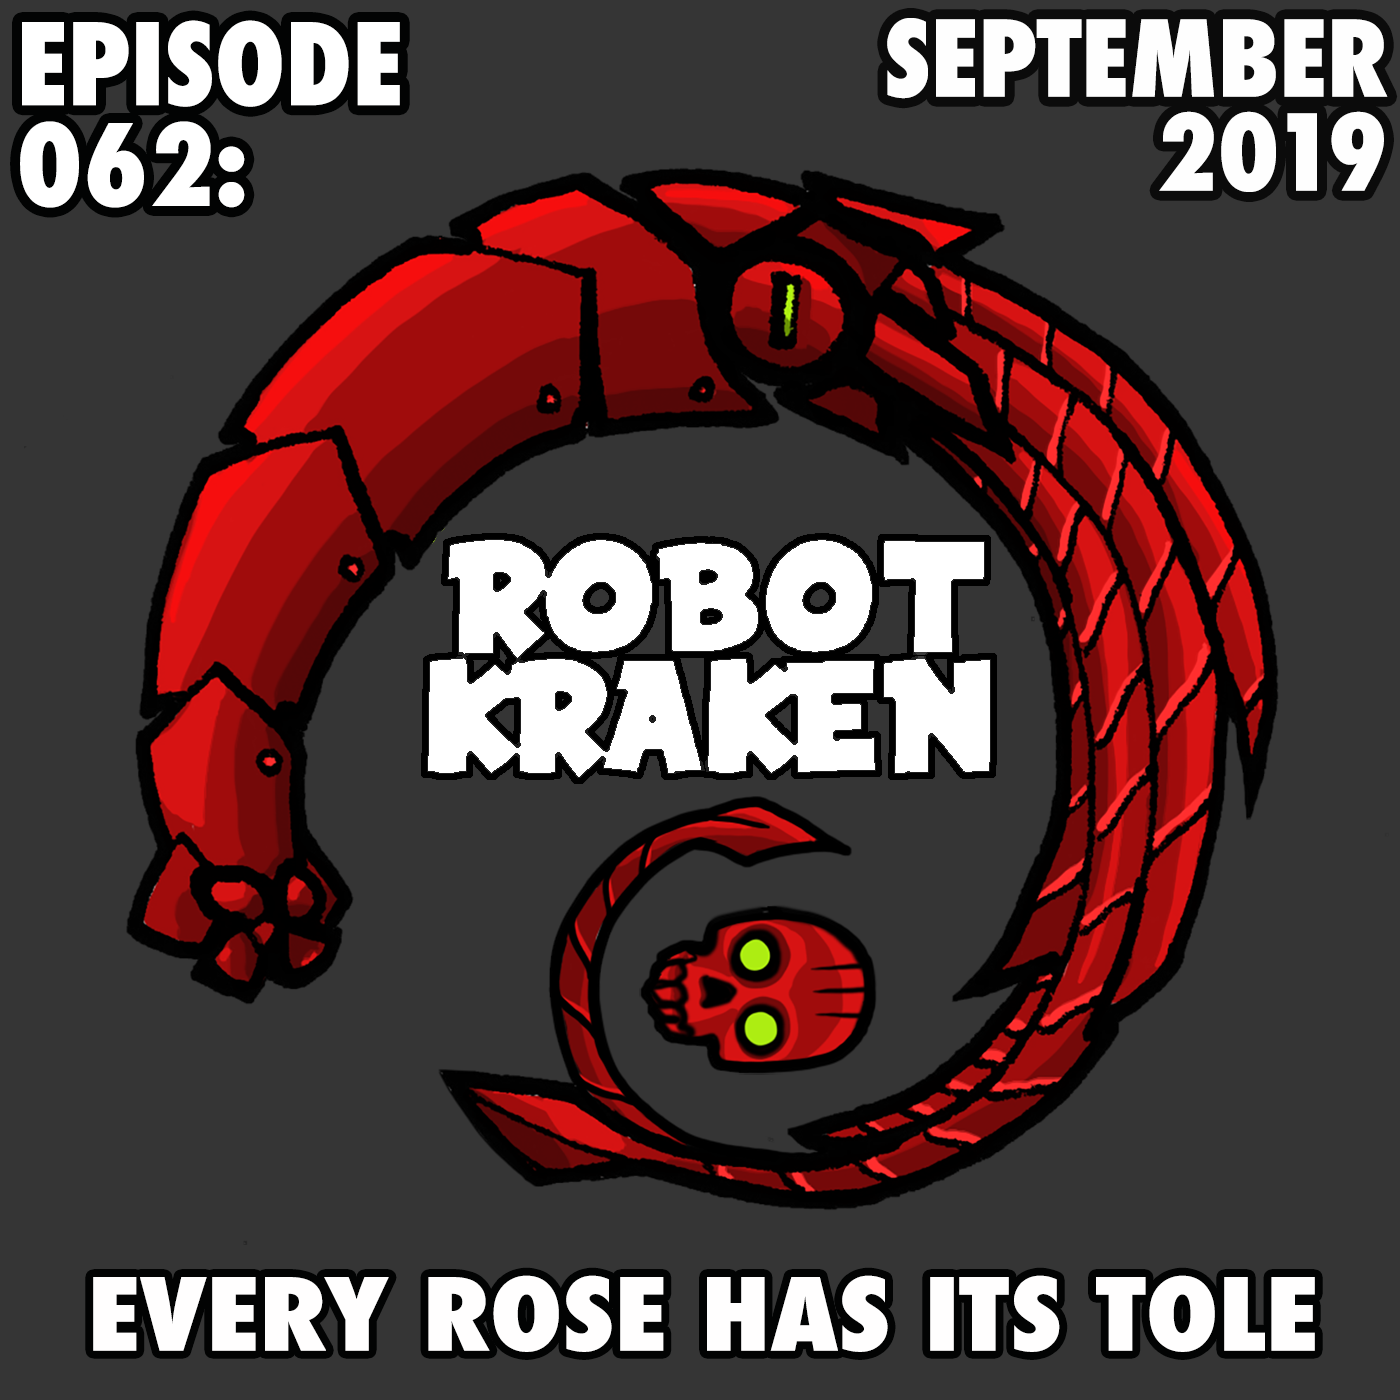 Robot-Kraken-062-Cover.png